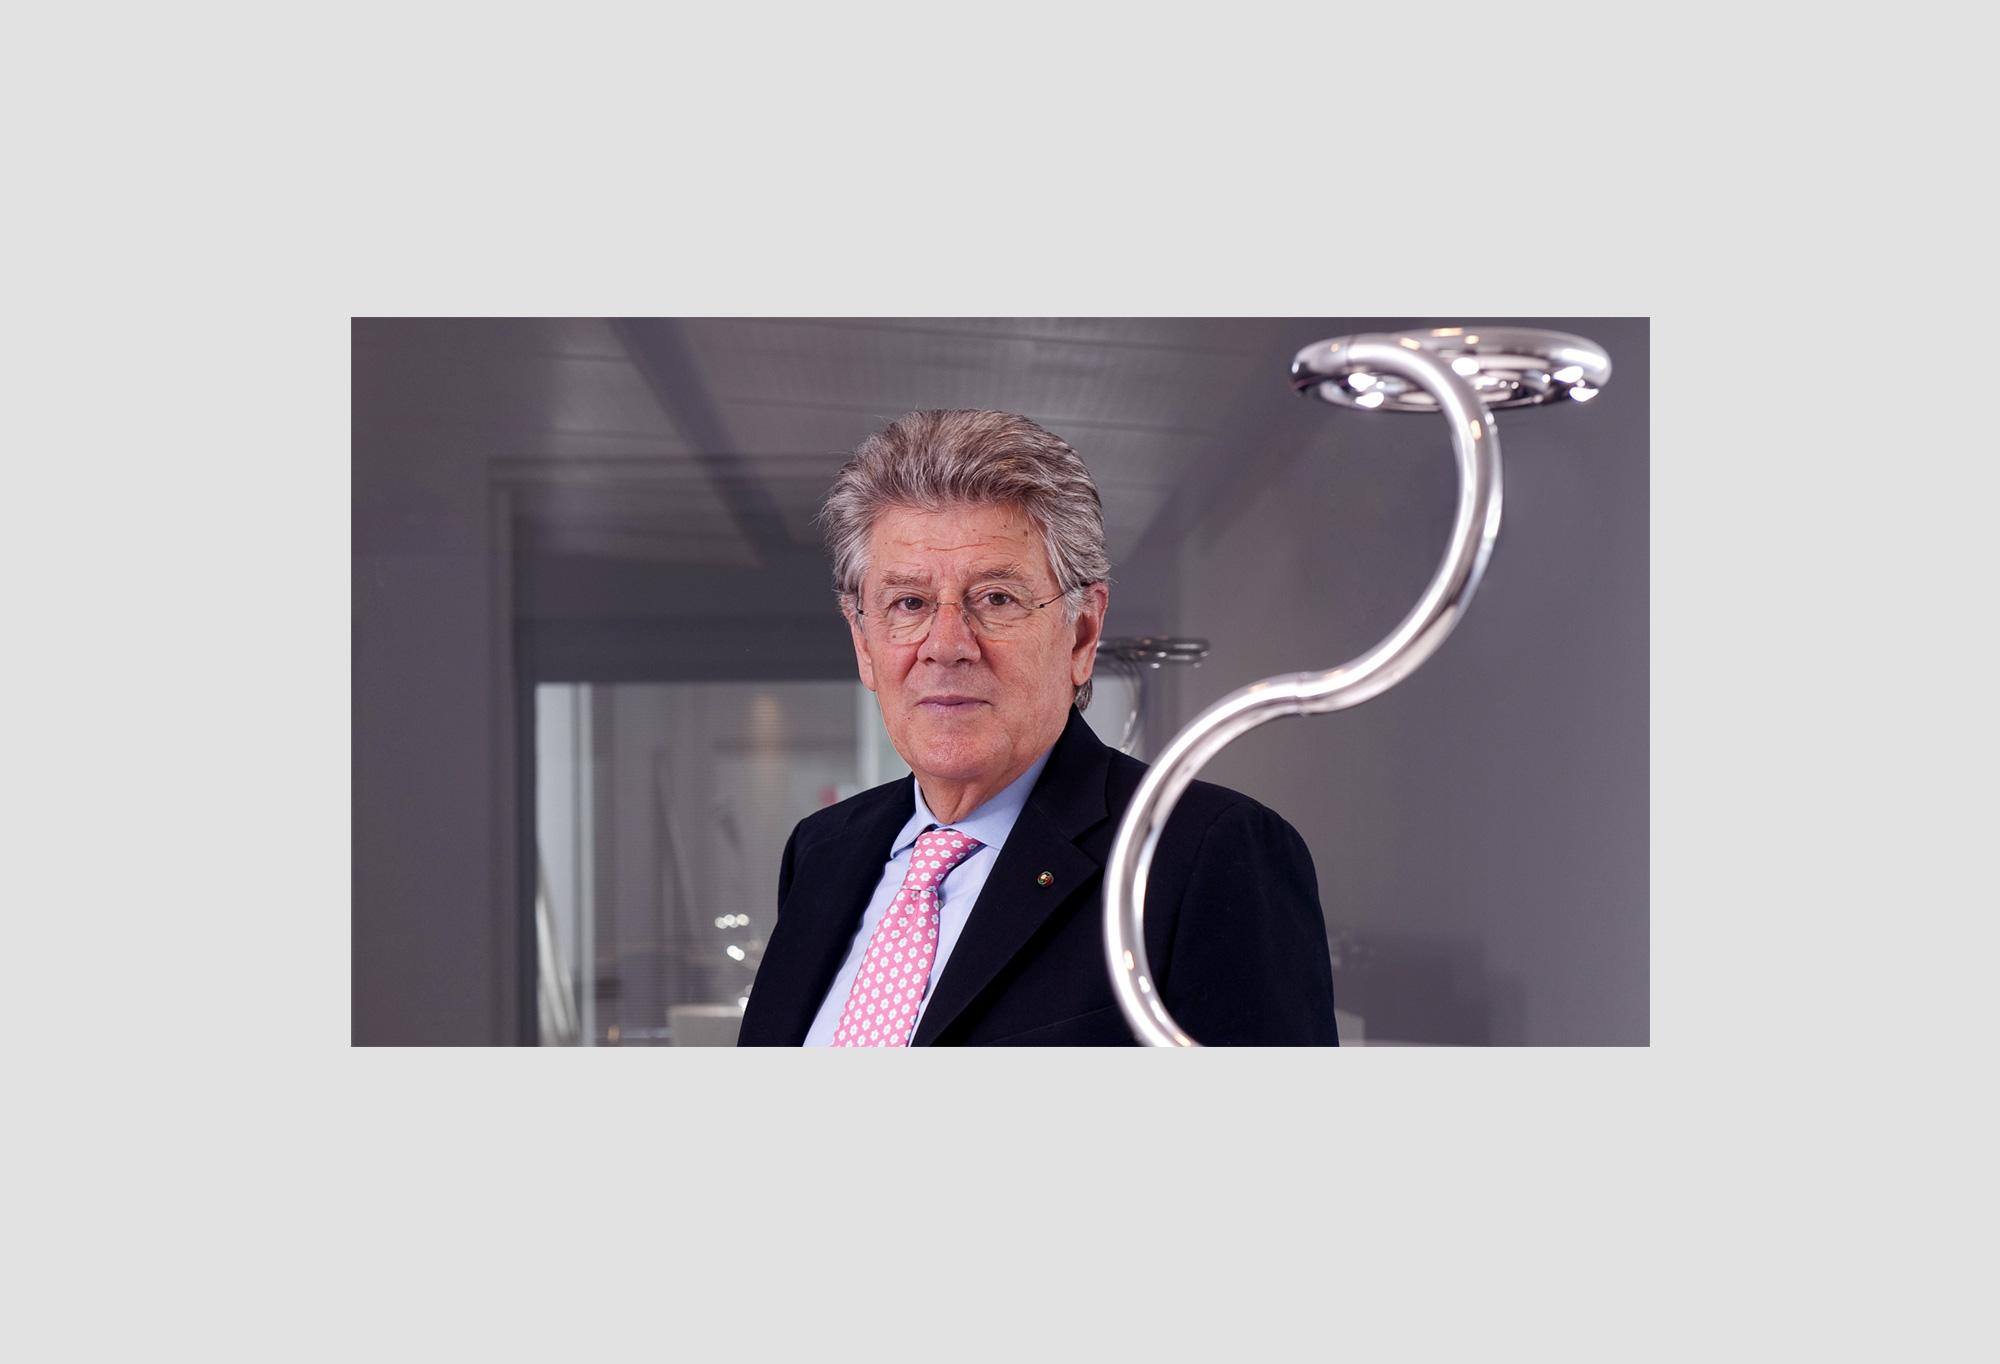 Adolfo Guzzini si racconta al SAAD - 27-11-2018